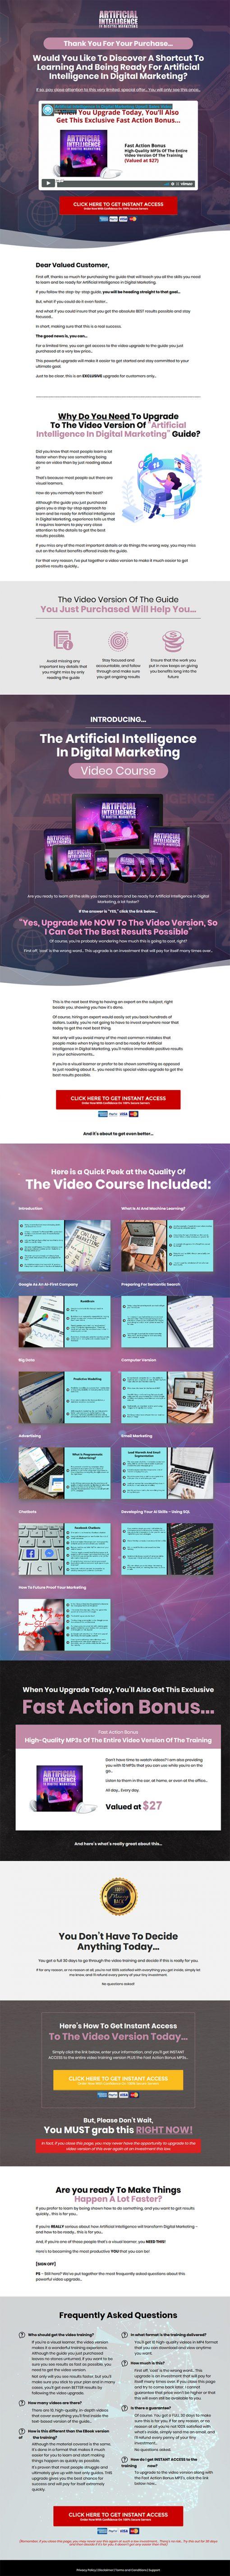 Artificial Intelligence in Digital Marketing Ebook and Videos MRR